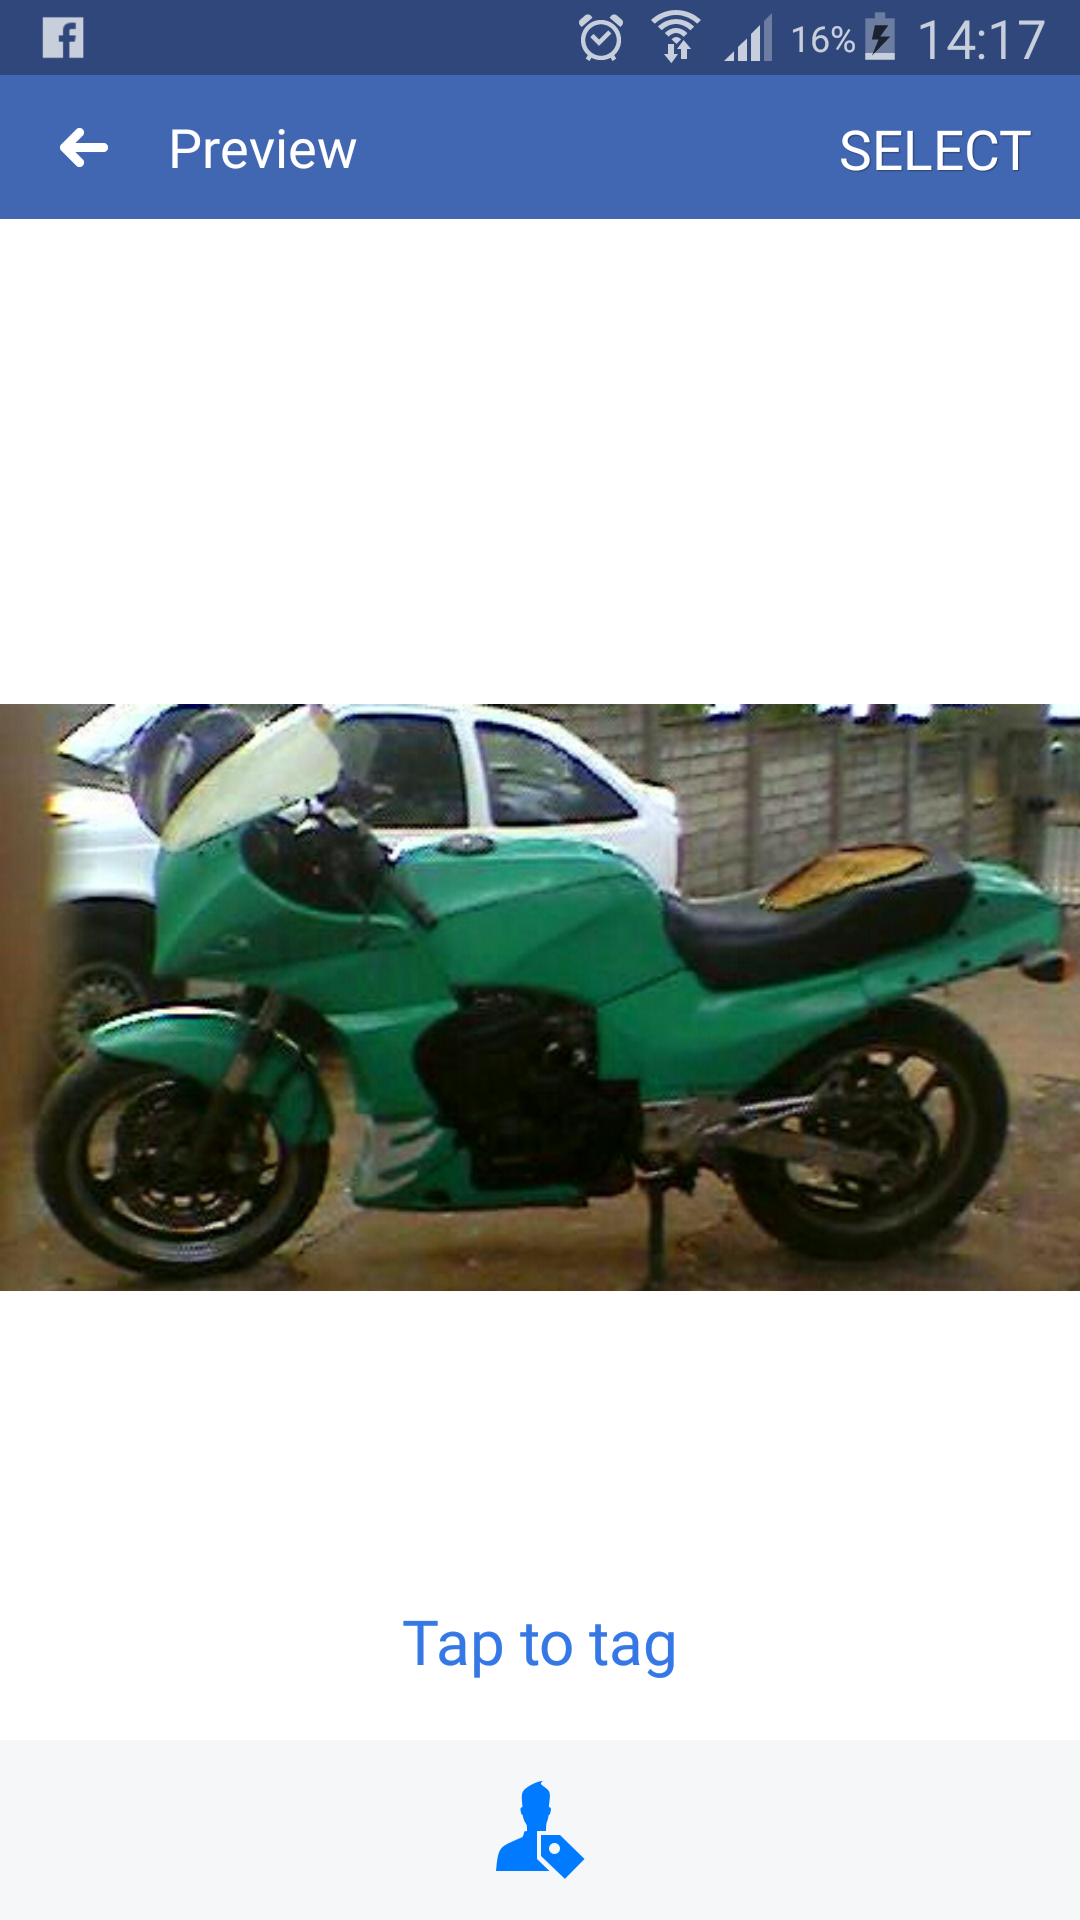 1988 Kawasaki Ninja